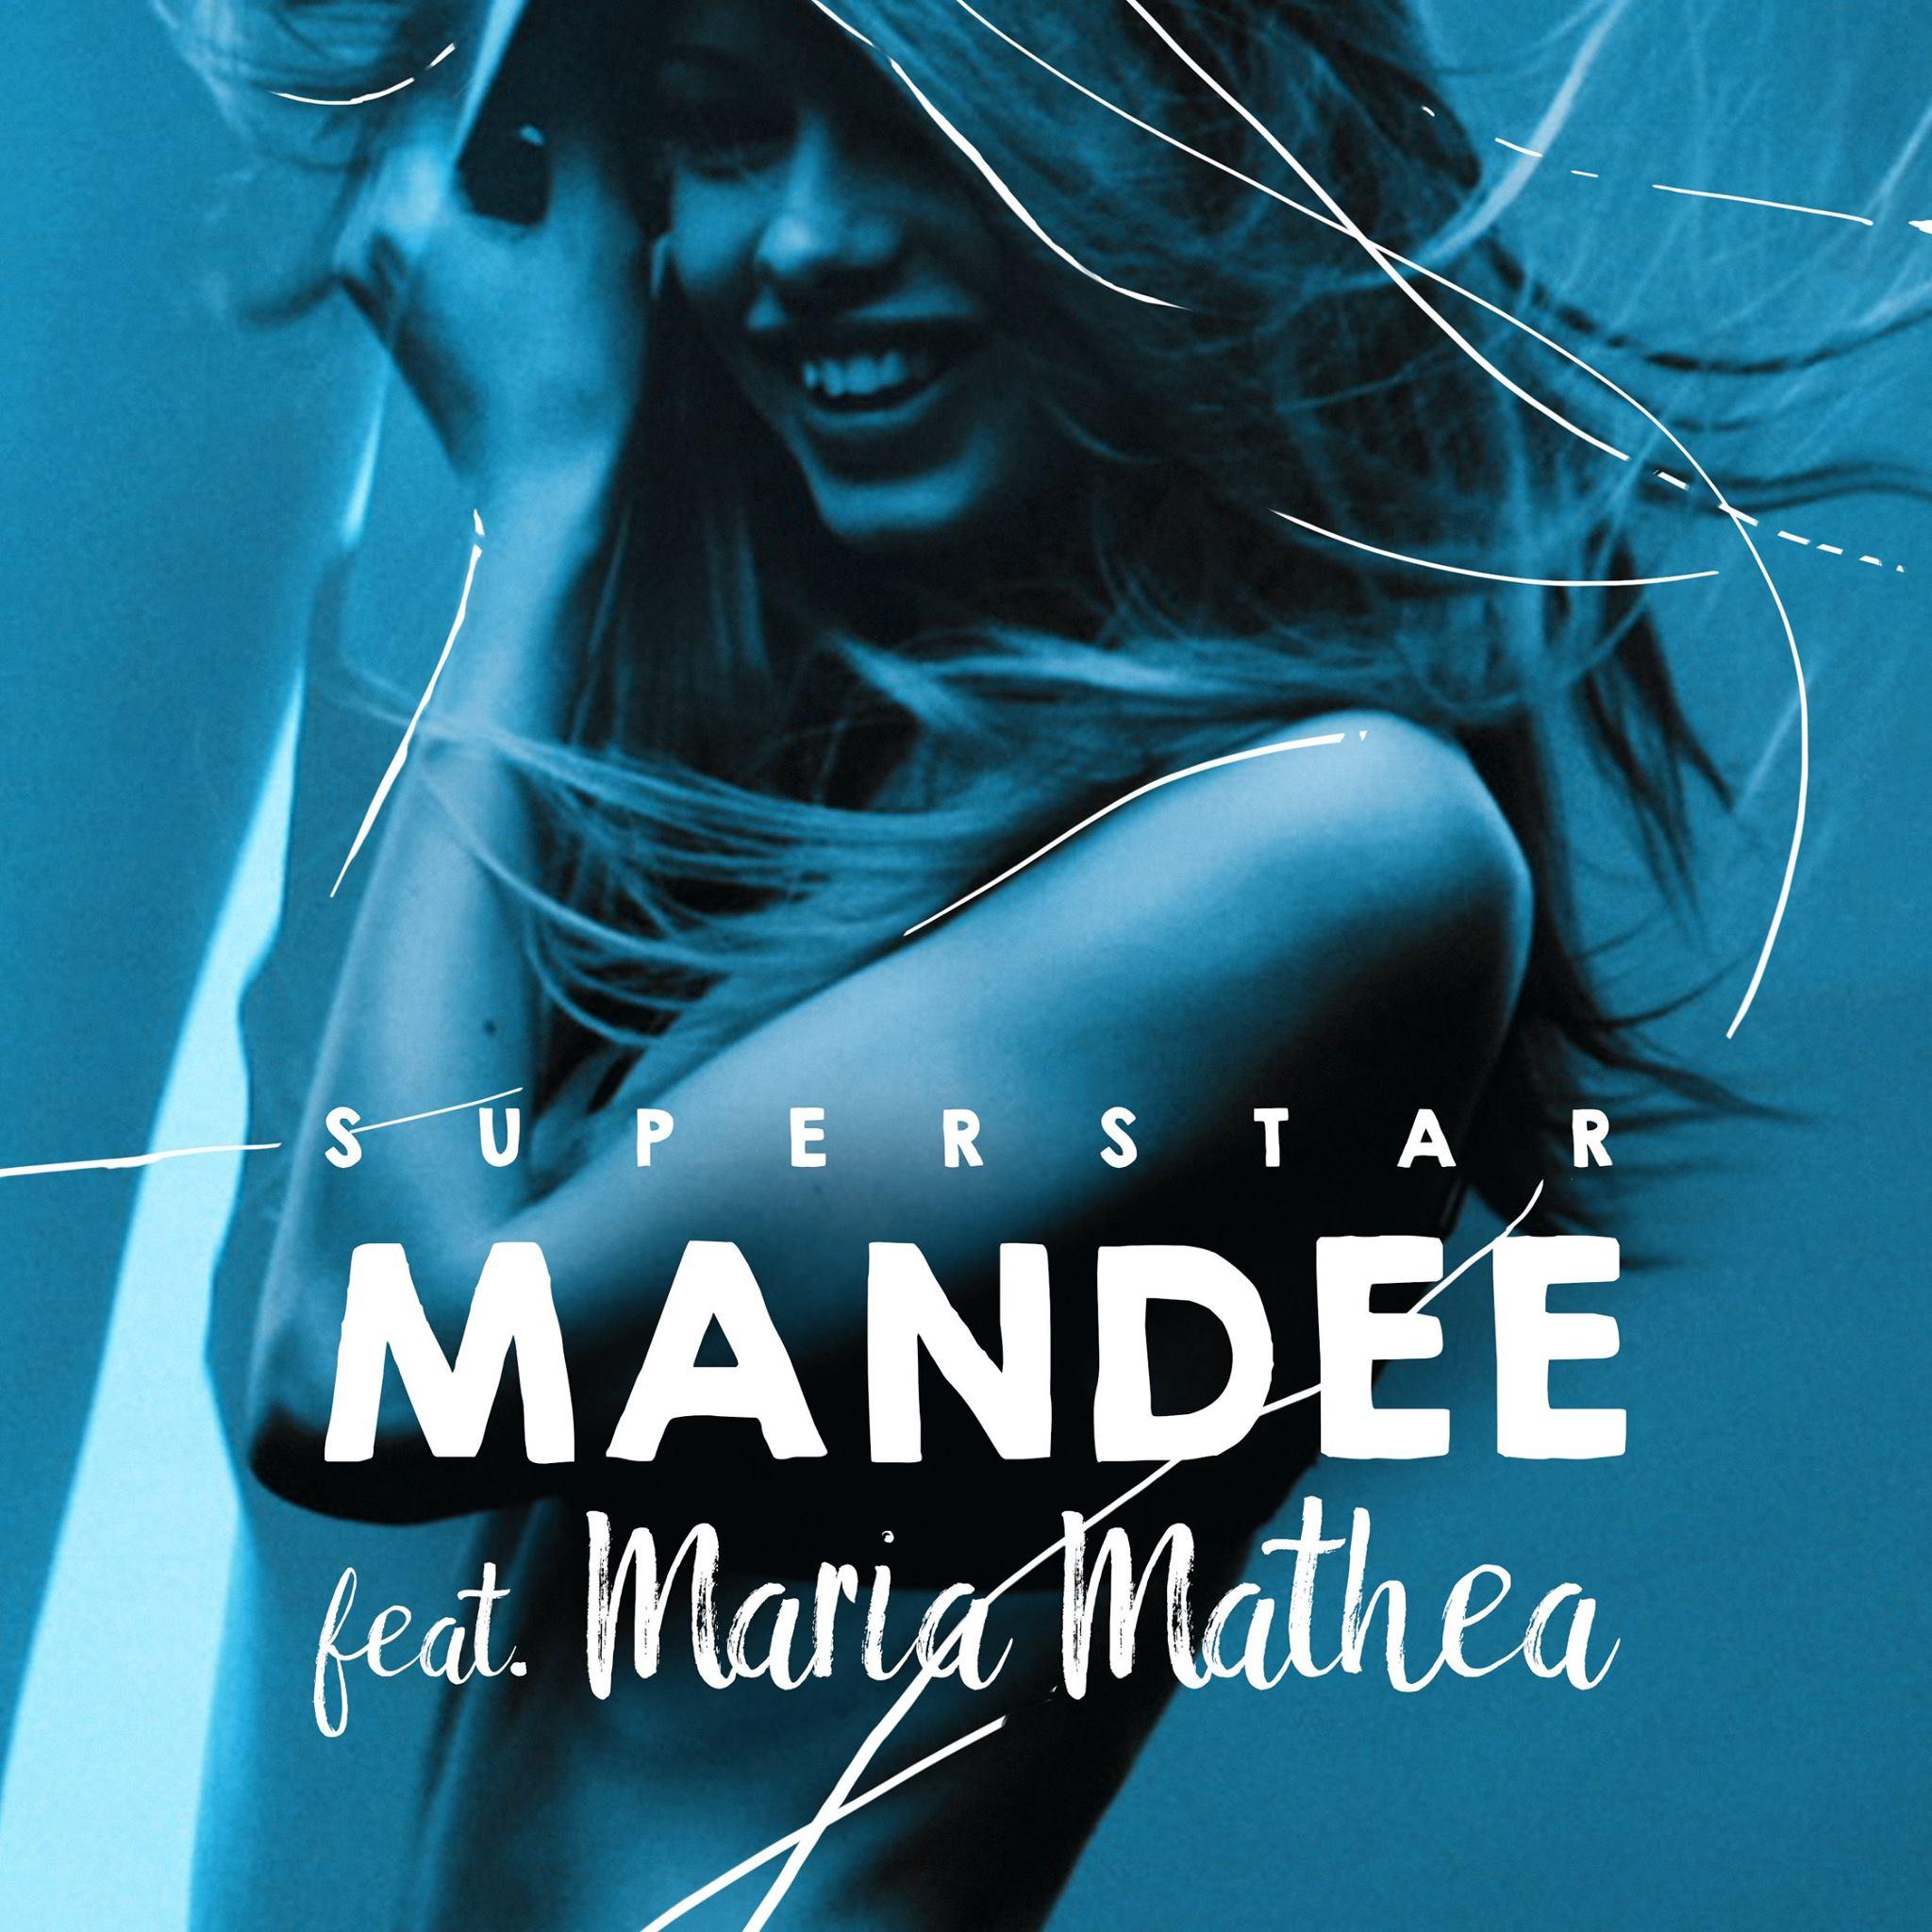 MANDEE / SUPERSTAR